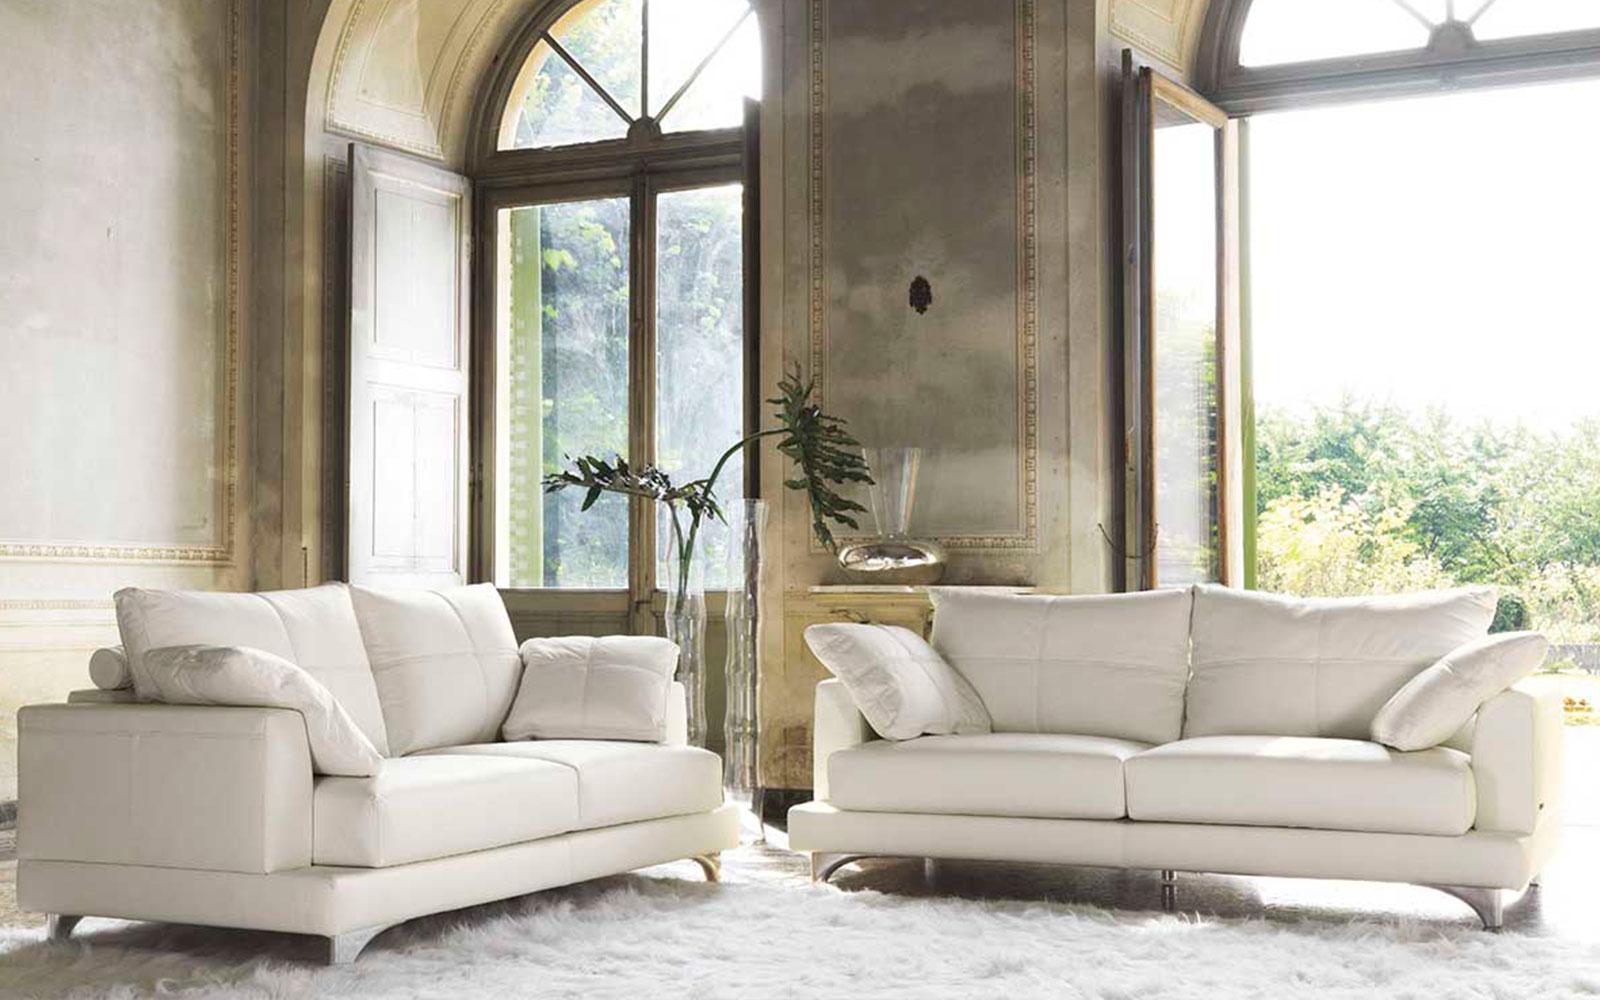 Emejing mobili francavilla fontana ideas for Fiusco arredi megastore